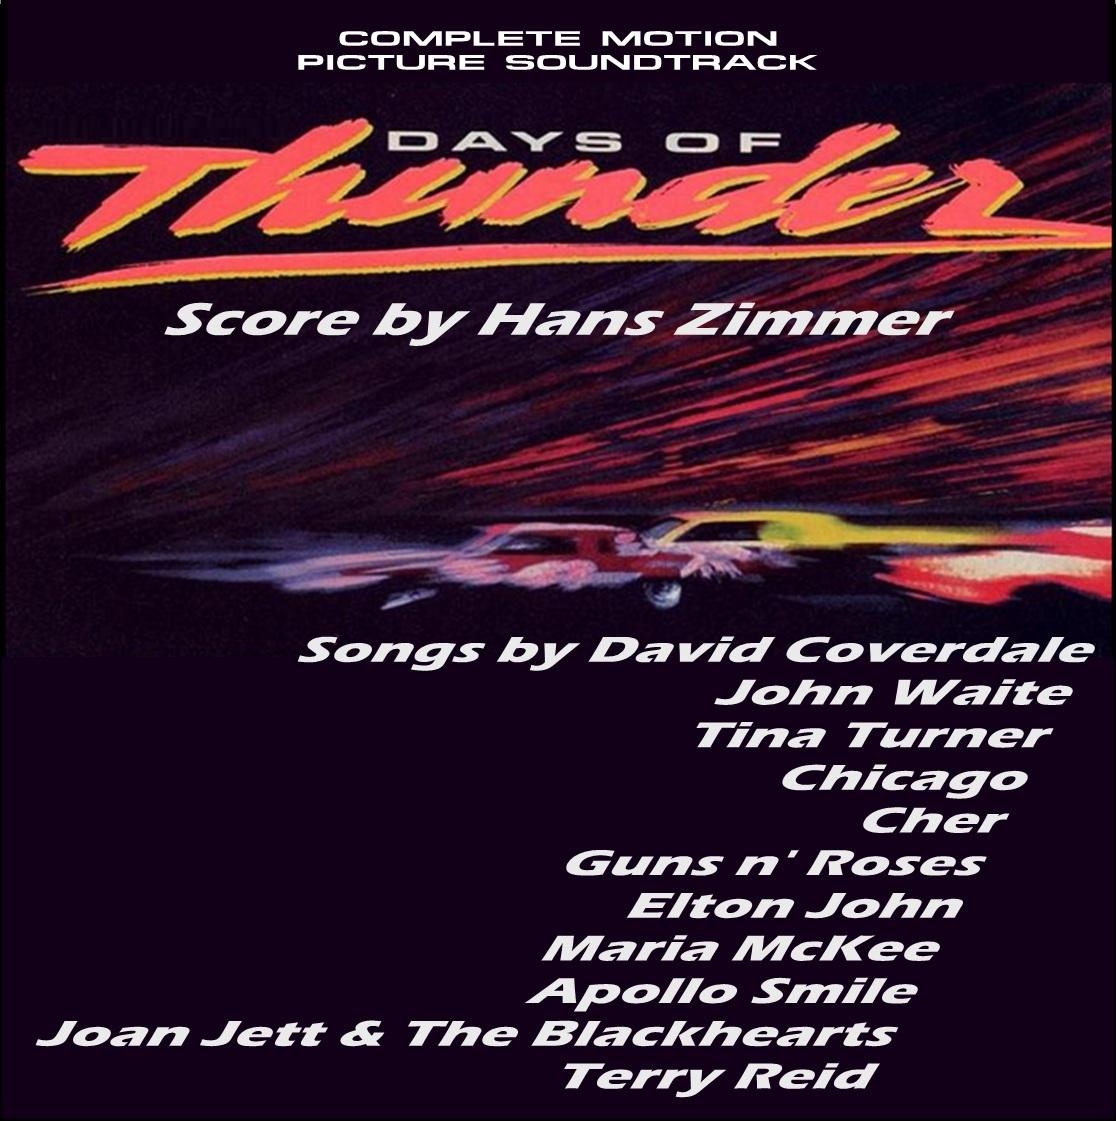 DAYS OF THUNDER - Complete Soundtrack [JRCD 080228-1] | MIS